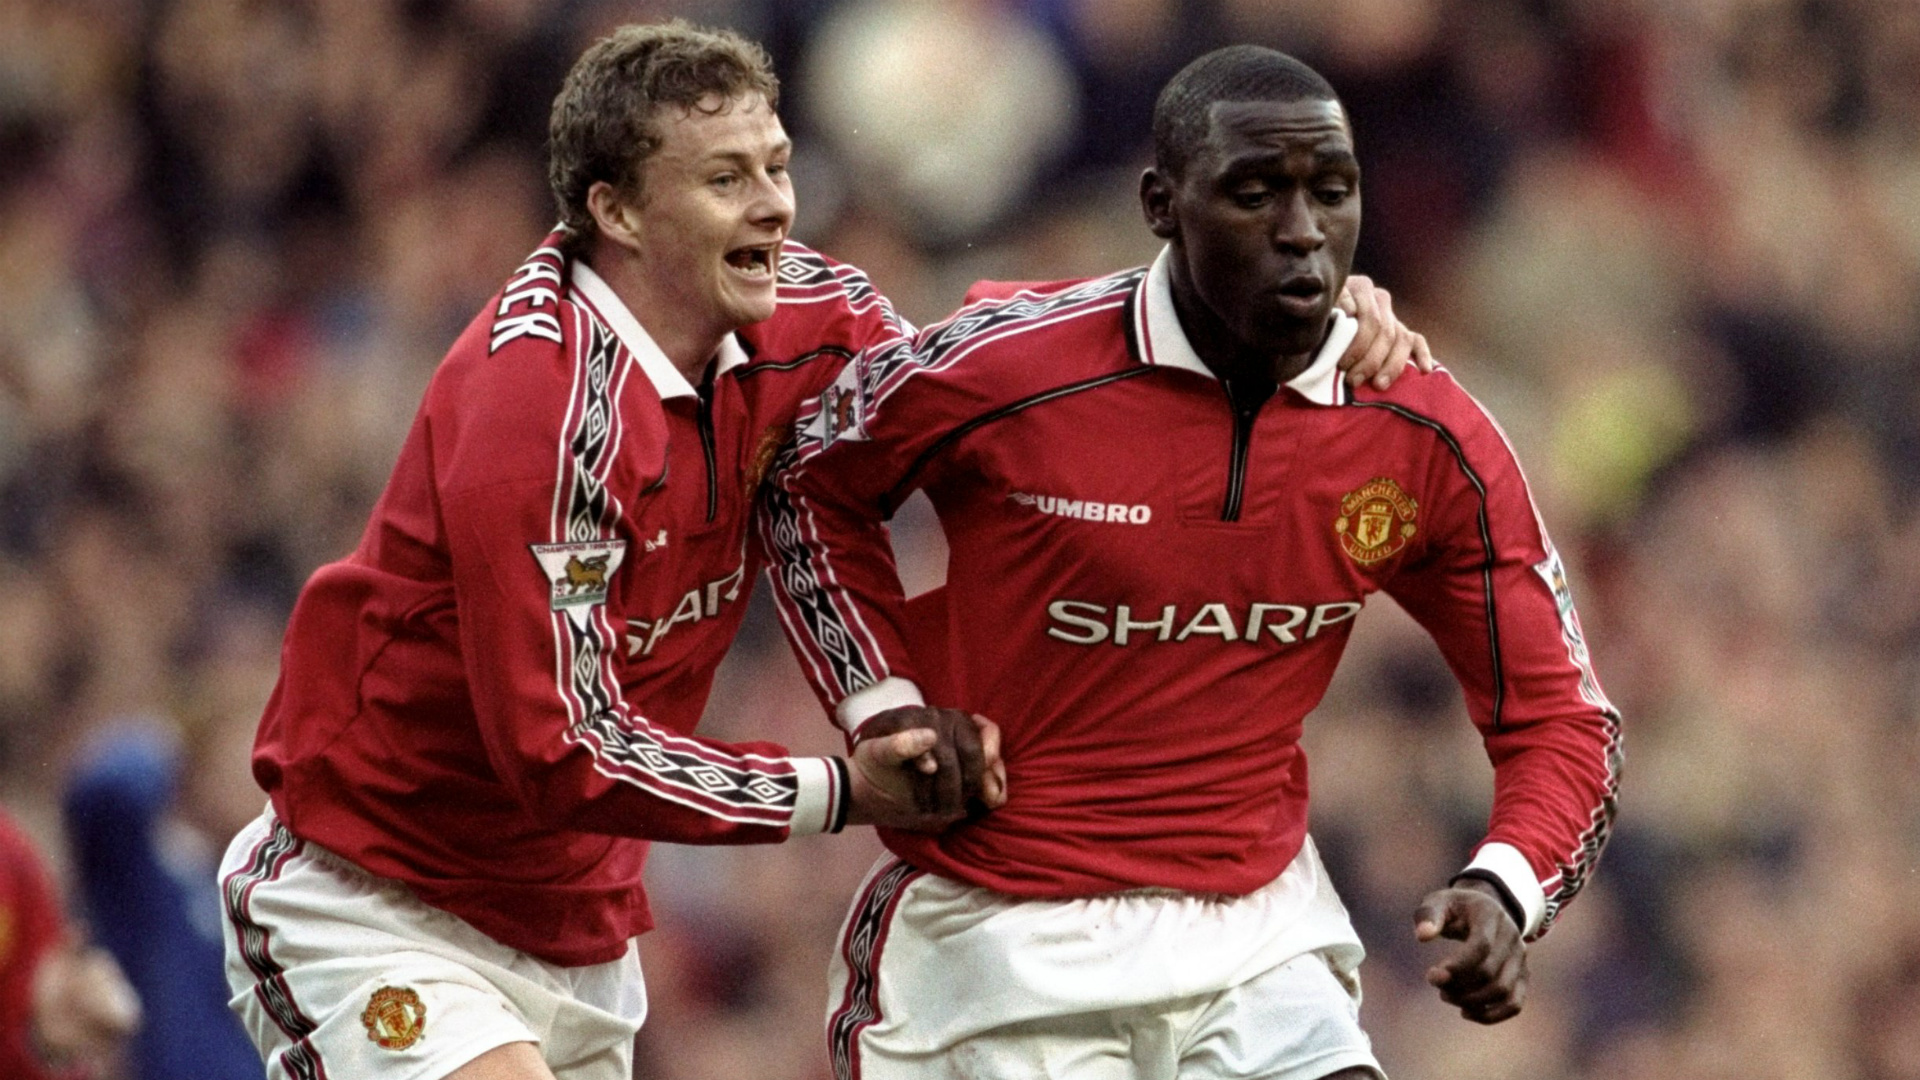 Roy Keane on treble team: Man Utd lucky to have unselfish, brilliant strikers